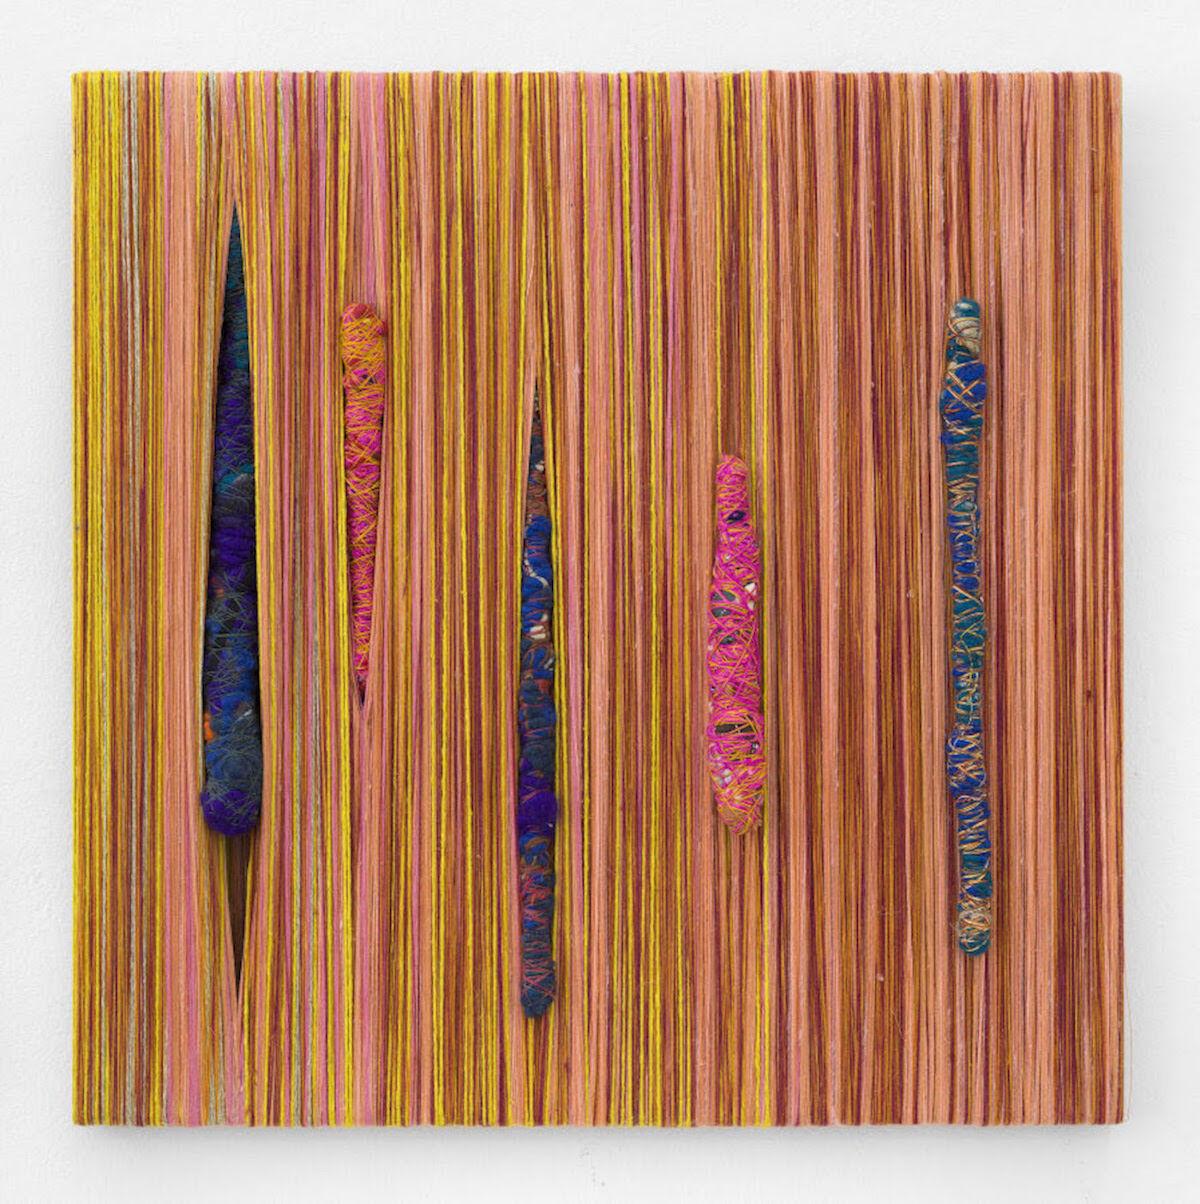 Sheila Hicks, Zihzabal, 2018, pigments, synthetic fibers, cotton, linen. Courtesy the artist and galerie frank elbaz.